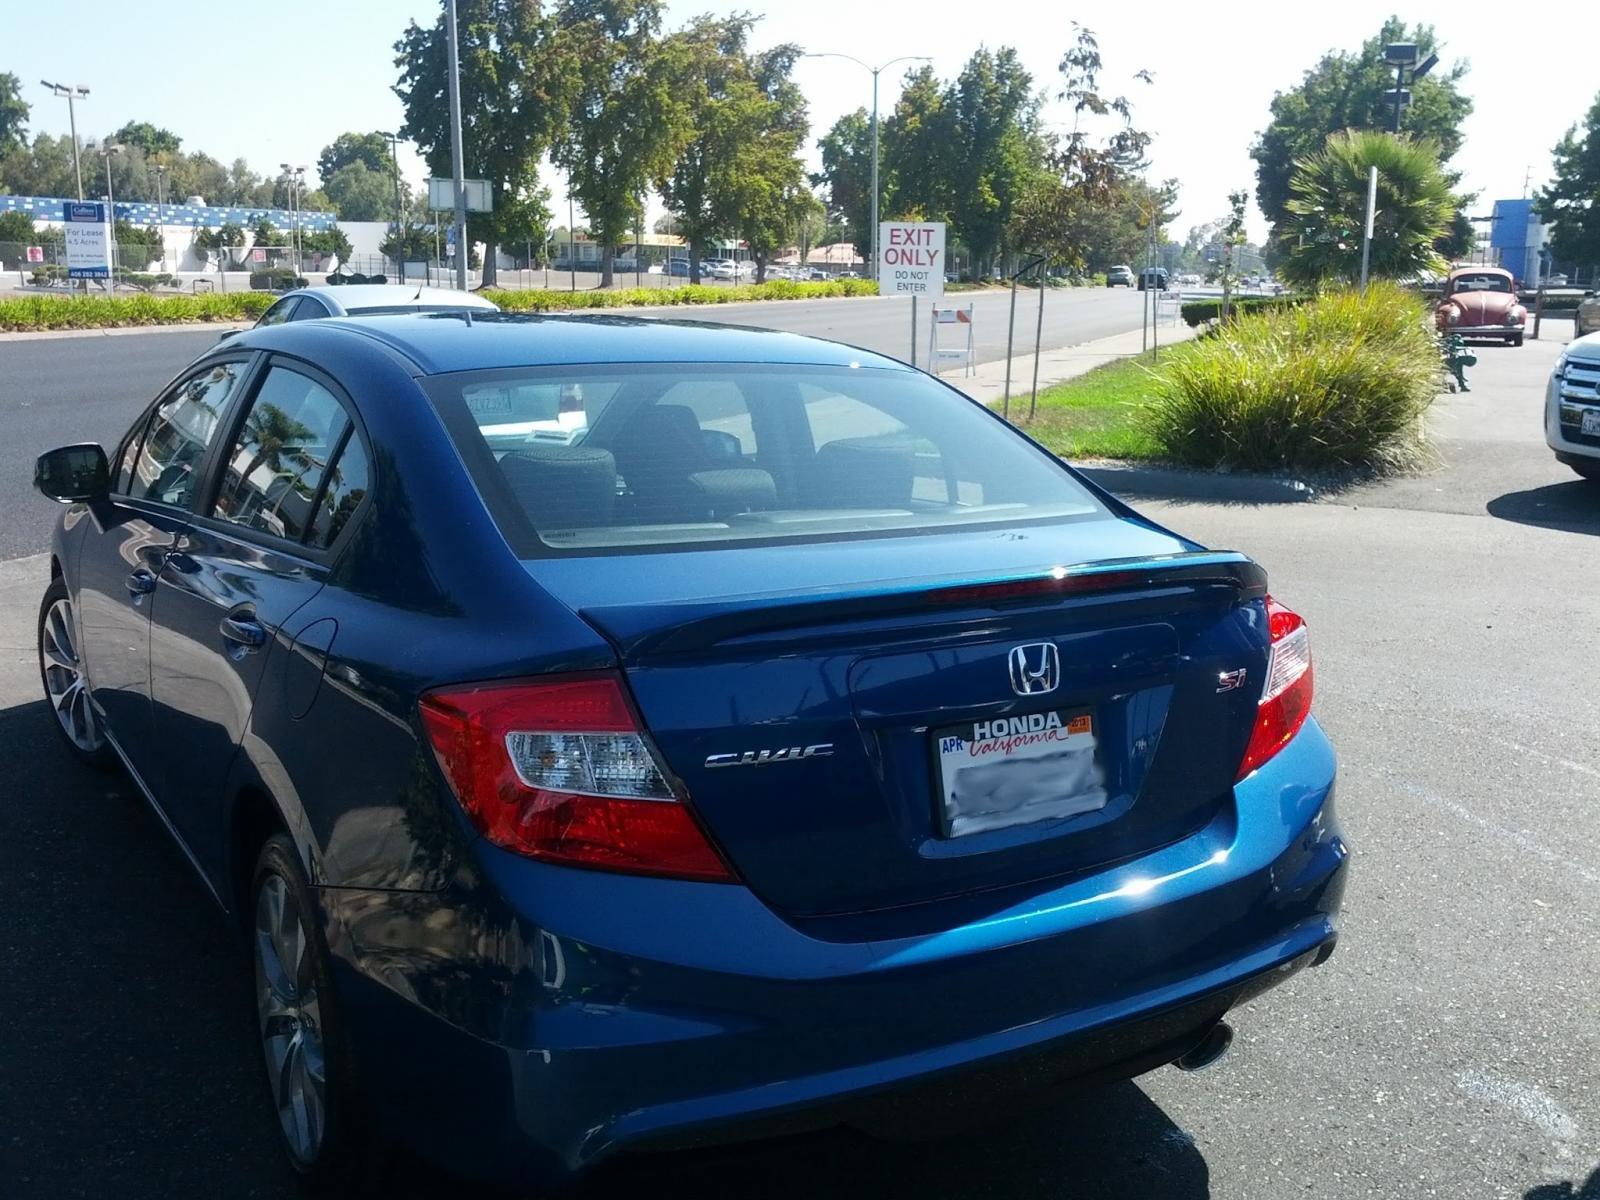 2012 Civic Si Sedan. Dyno Blue Pearl-back.jpg